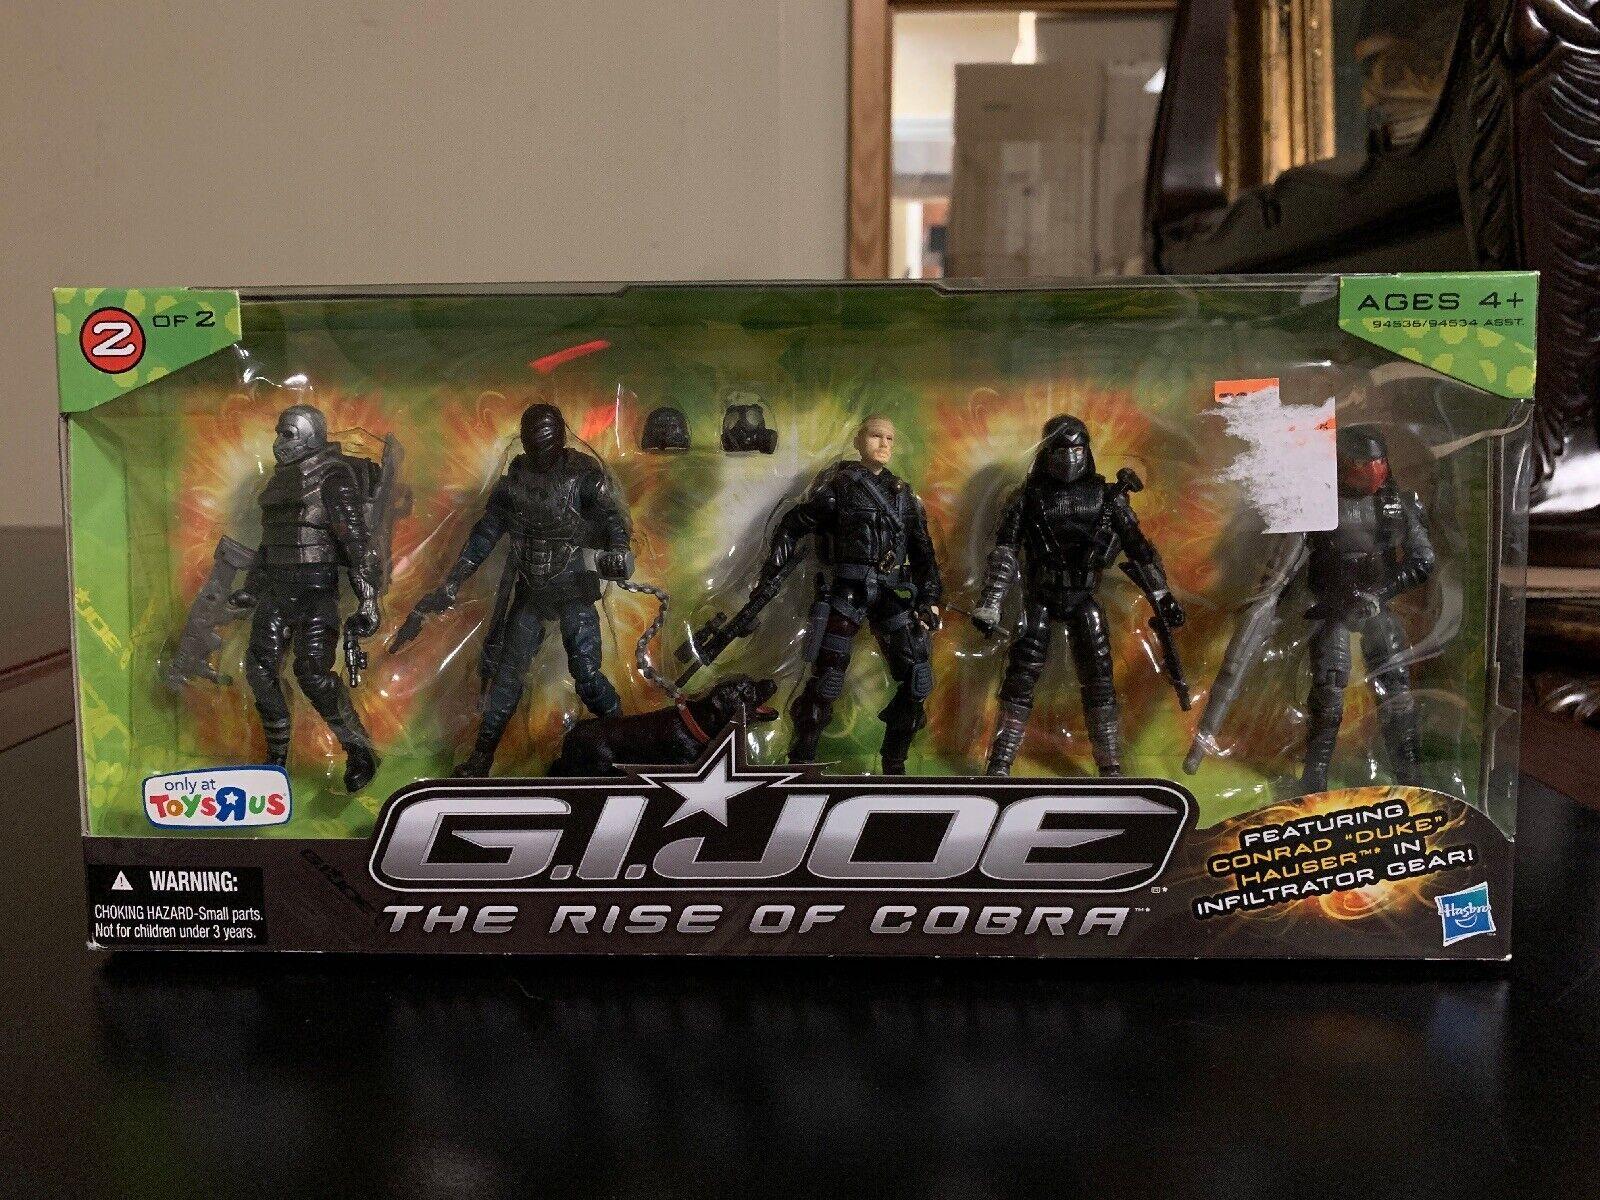 Gi Joe Rise Of Cobra Duke Infiltrator 2009 2 de 2 figuras de 5 Juguetes R Us Nuevo en caja sellada rareza